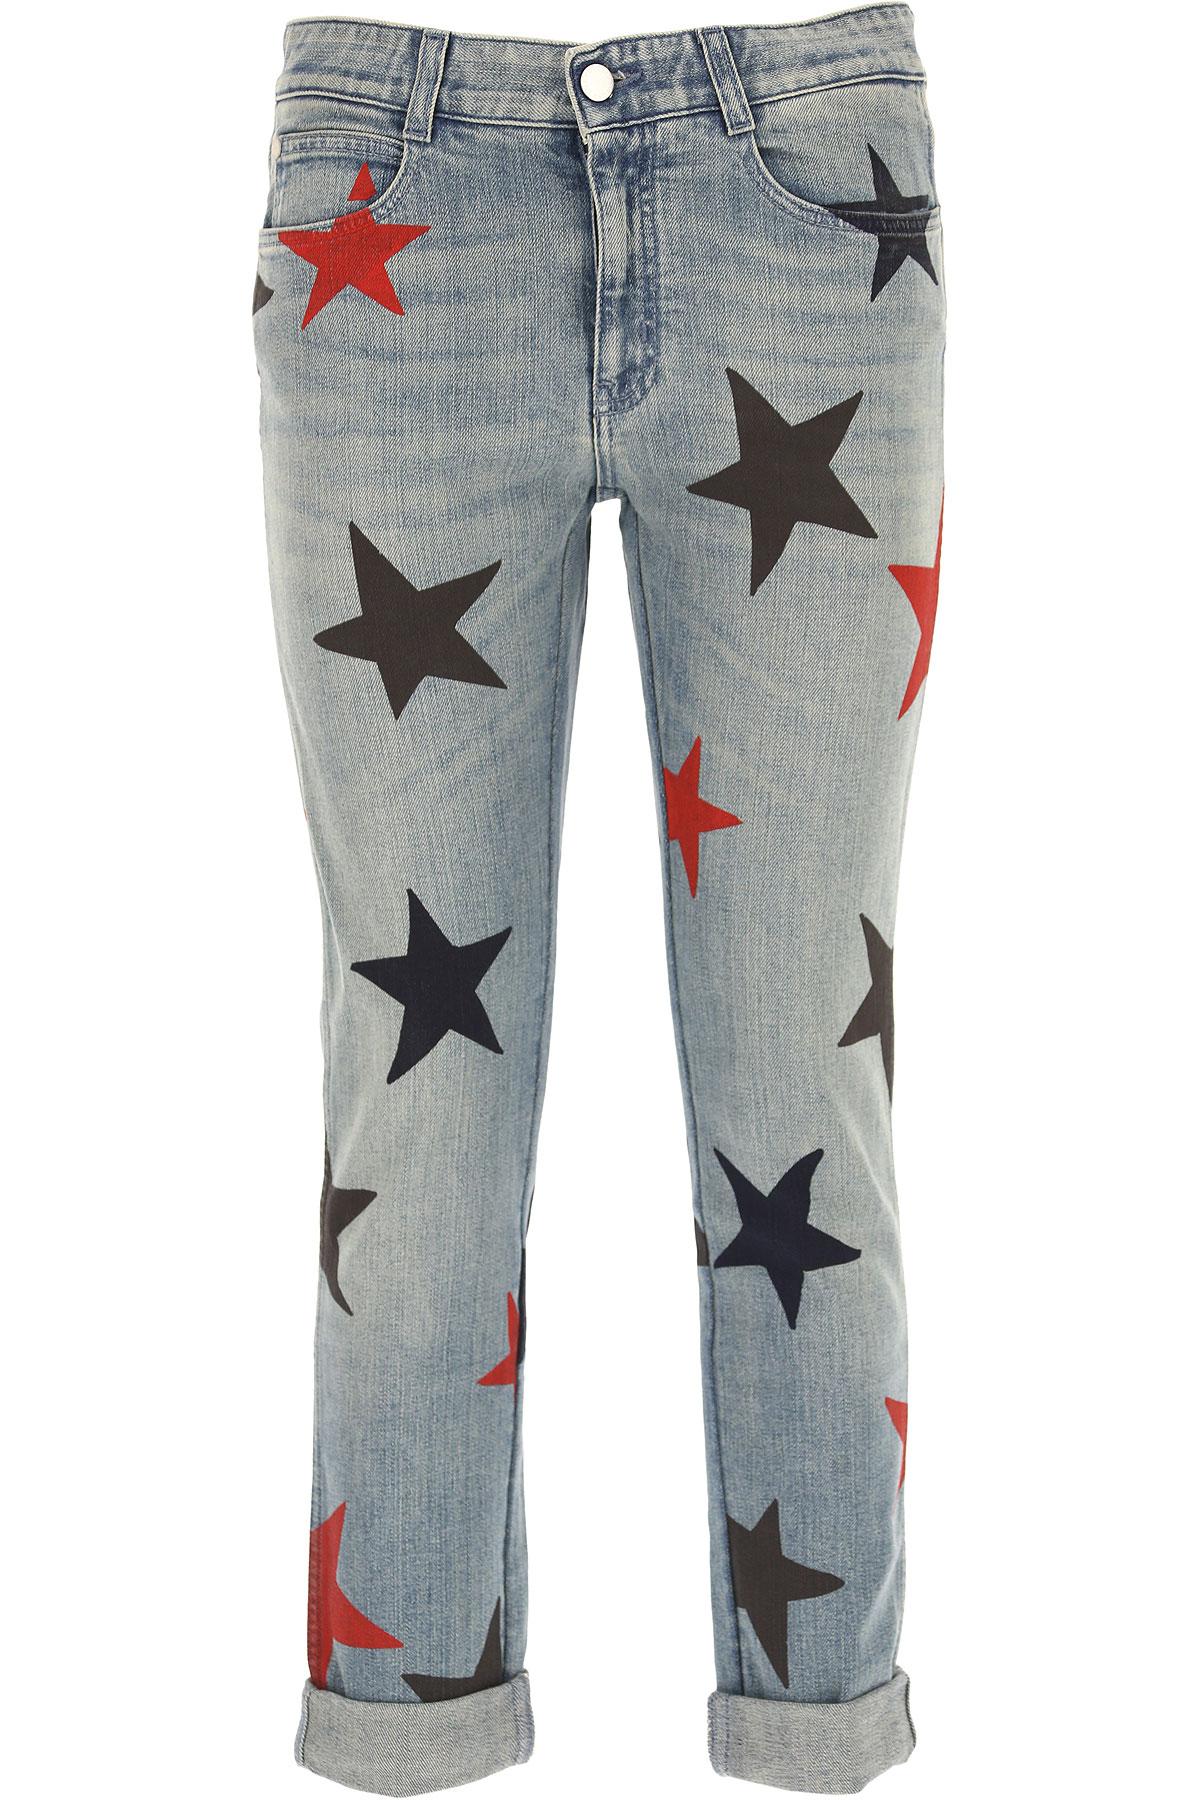 Stella McCartney Jeans, Denim Light Blue, Cotton, 2017, 26 28 USA-436695